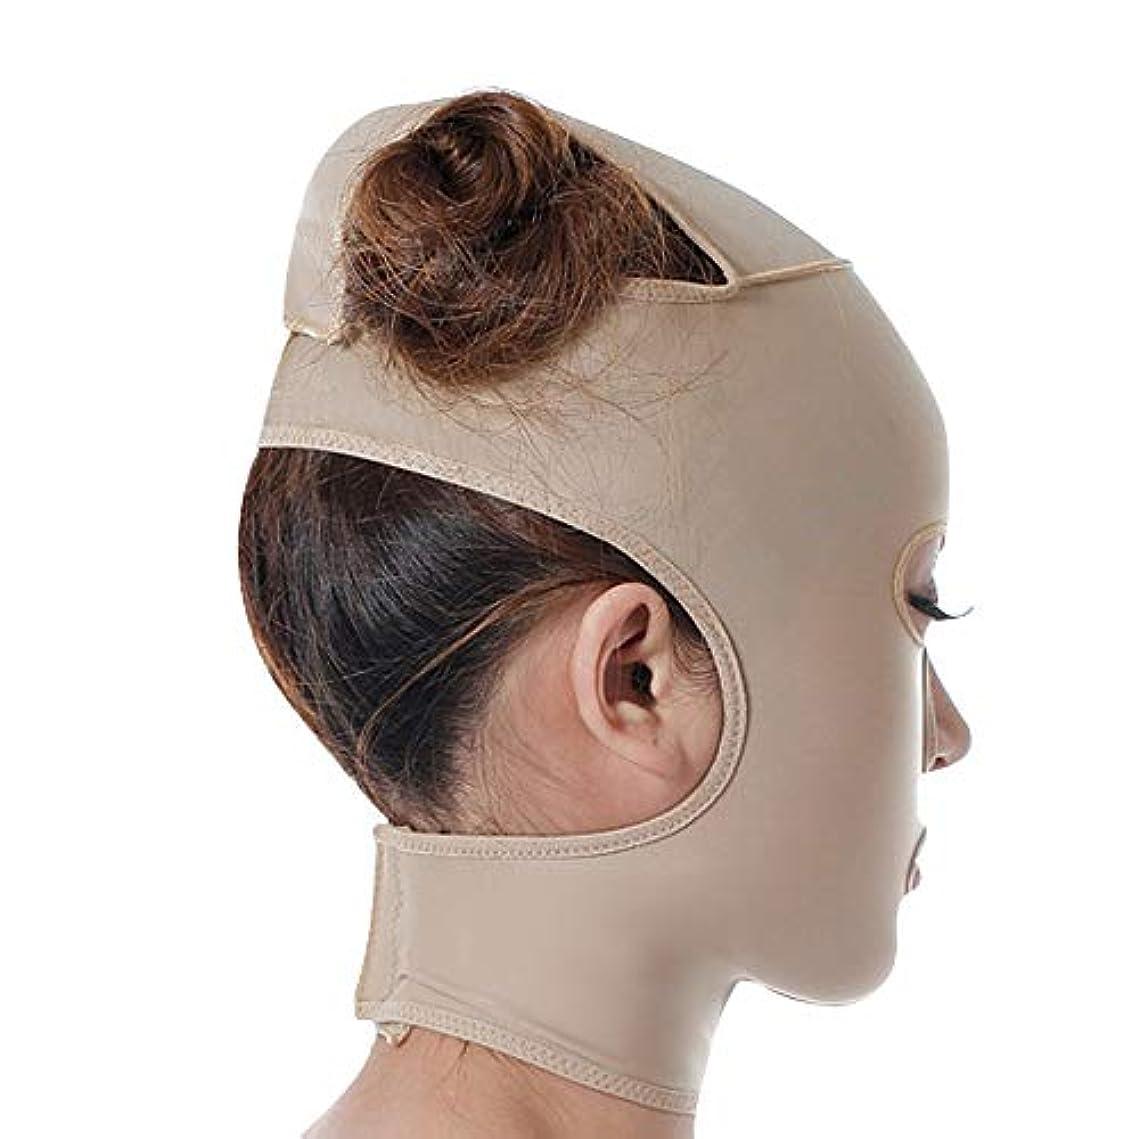 XHLMRMJ 引き締めフェイスマスク、フェイシャルマスク美容薬フェイスマスク美容Vフェイス包帯ライン彫刻リフティング引き締めダブルチンマスク (Size : L)